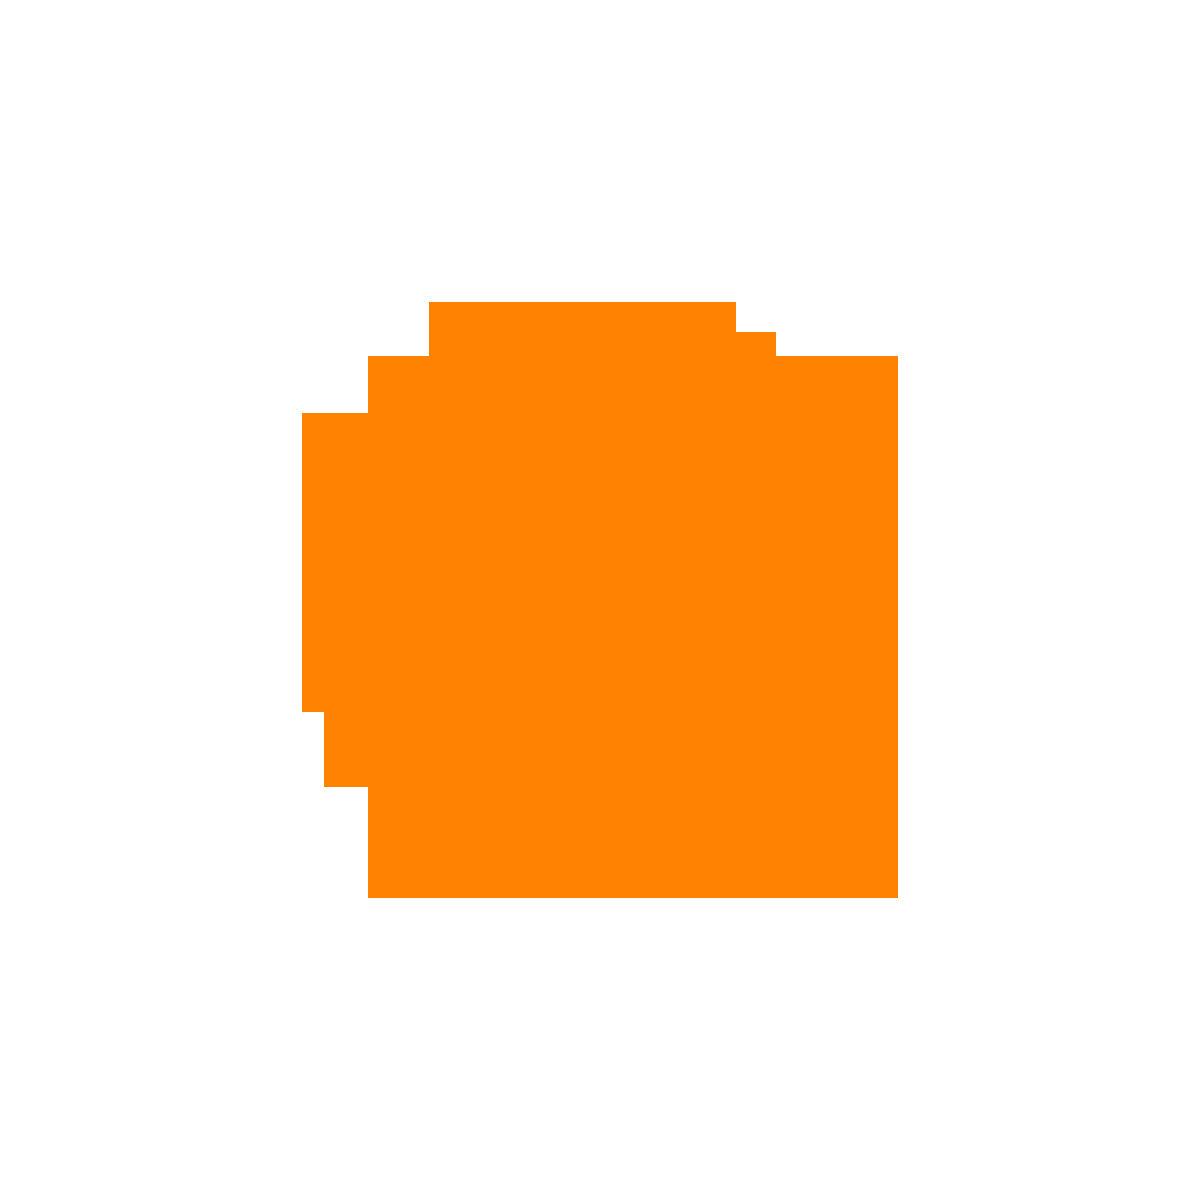 ArcTouch logo a no wordmark